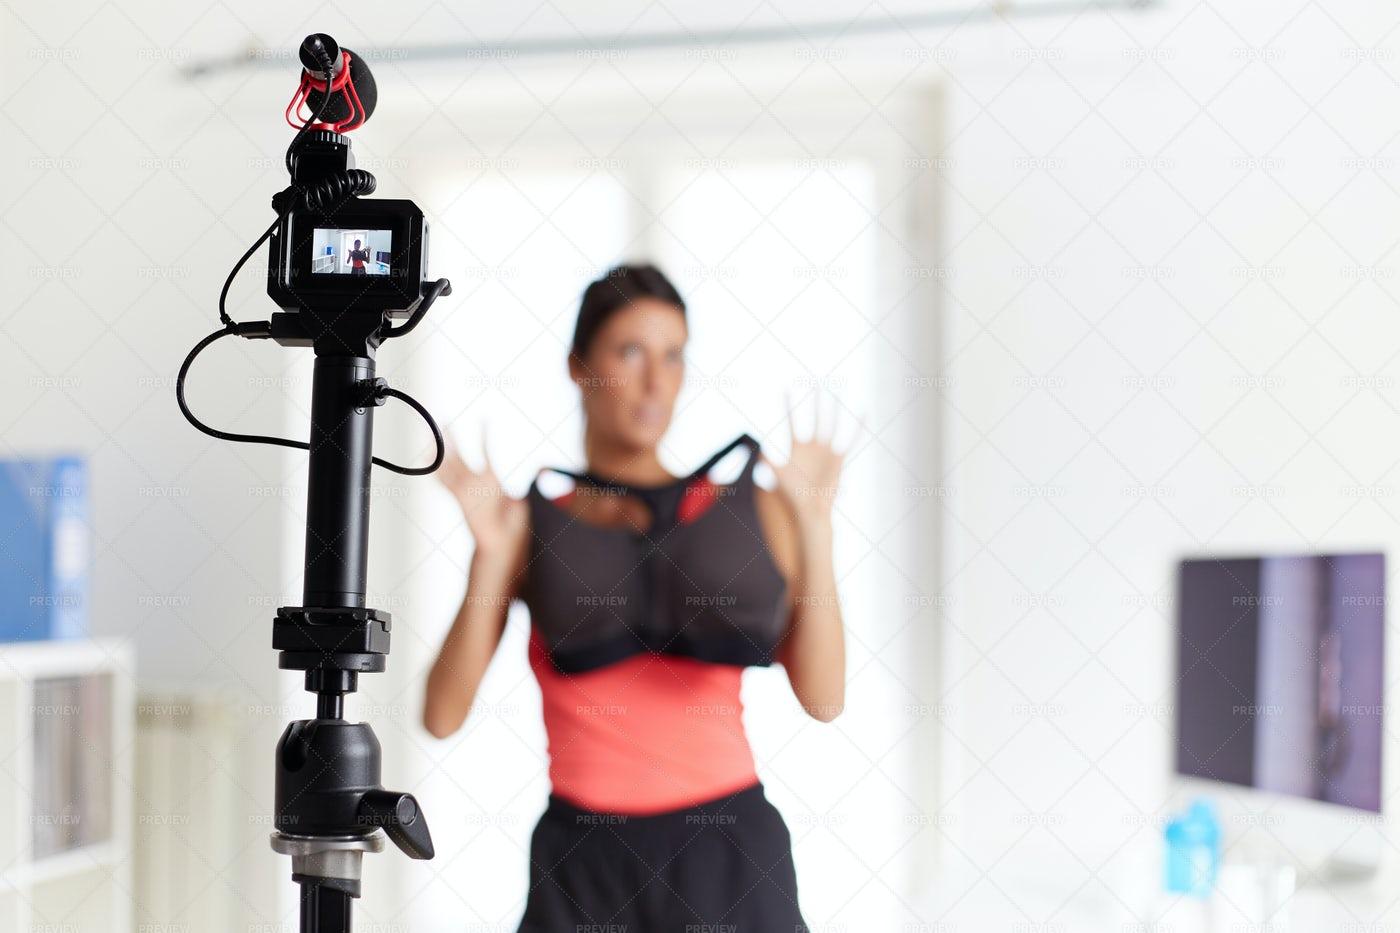 Vlog About New Bra: Stock Photos